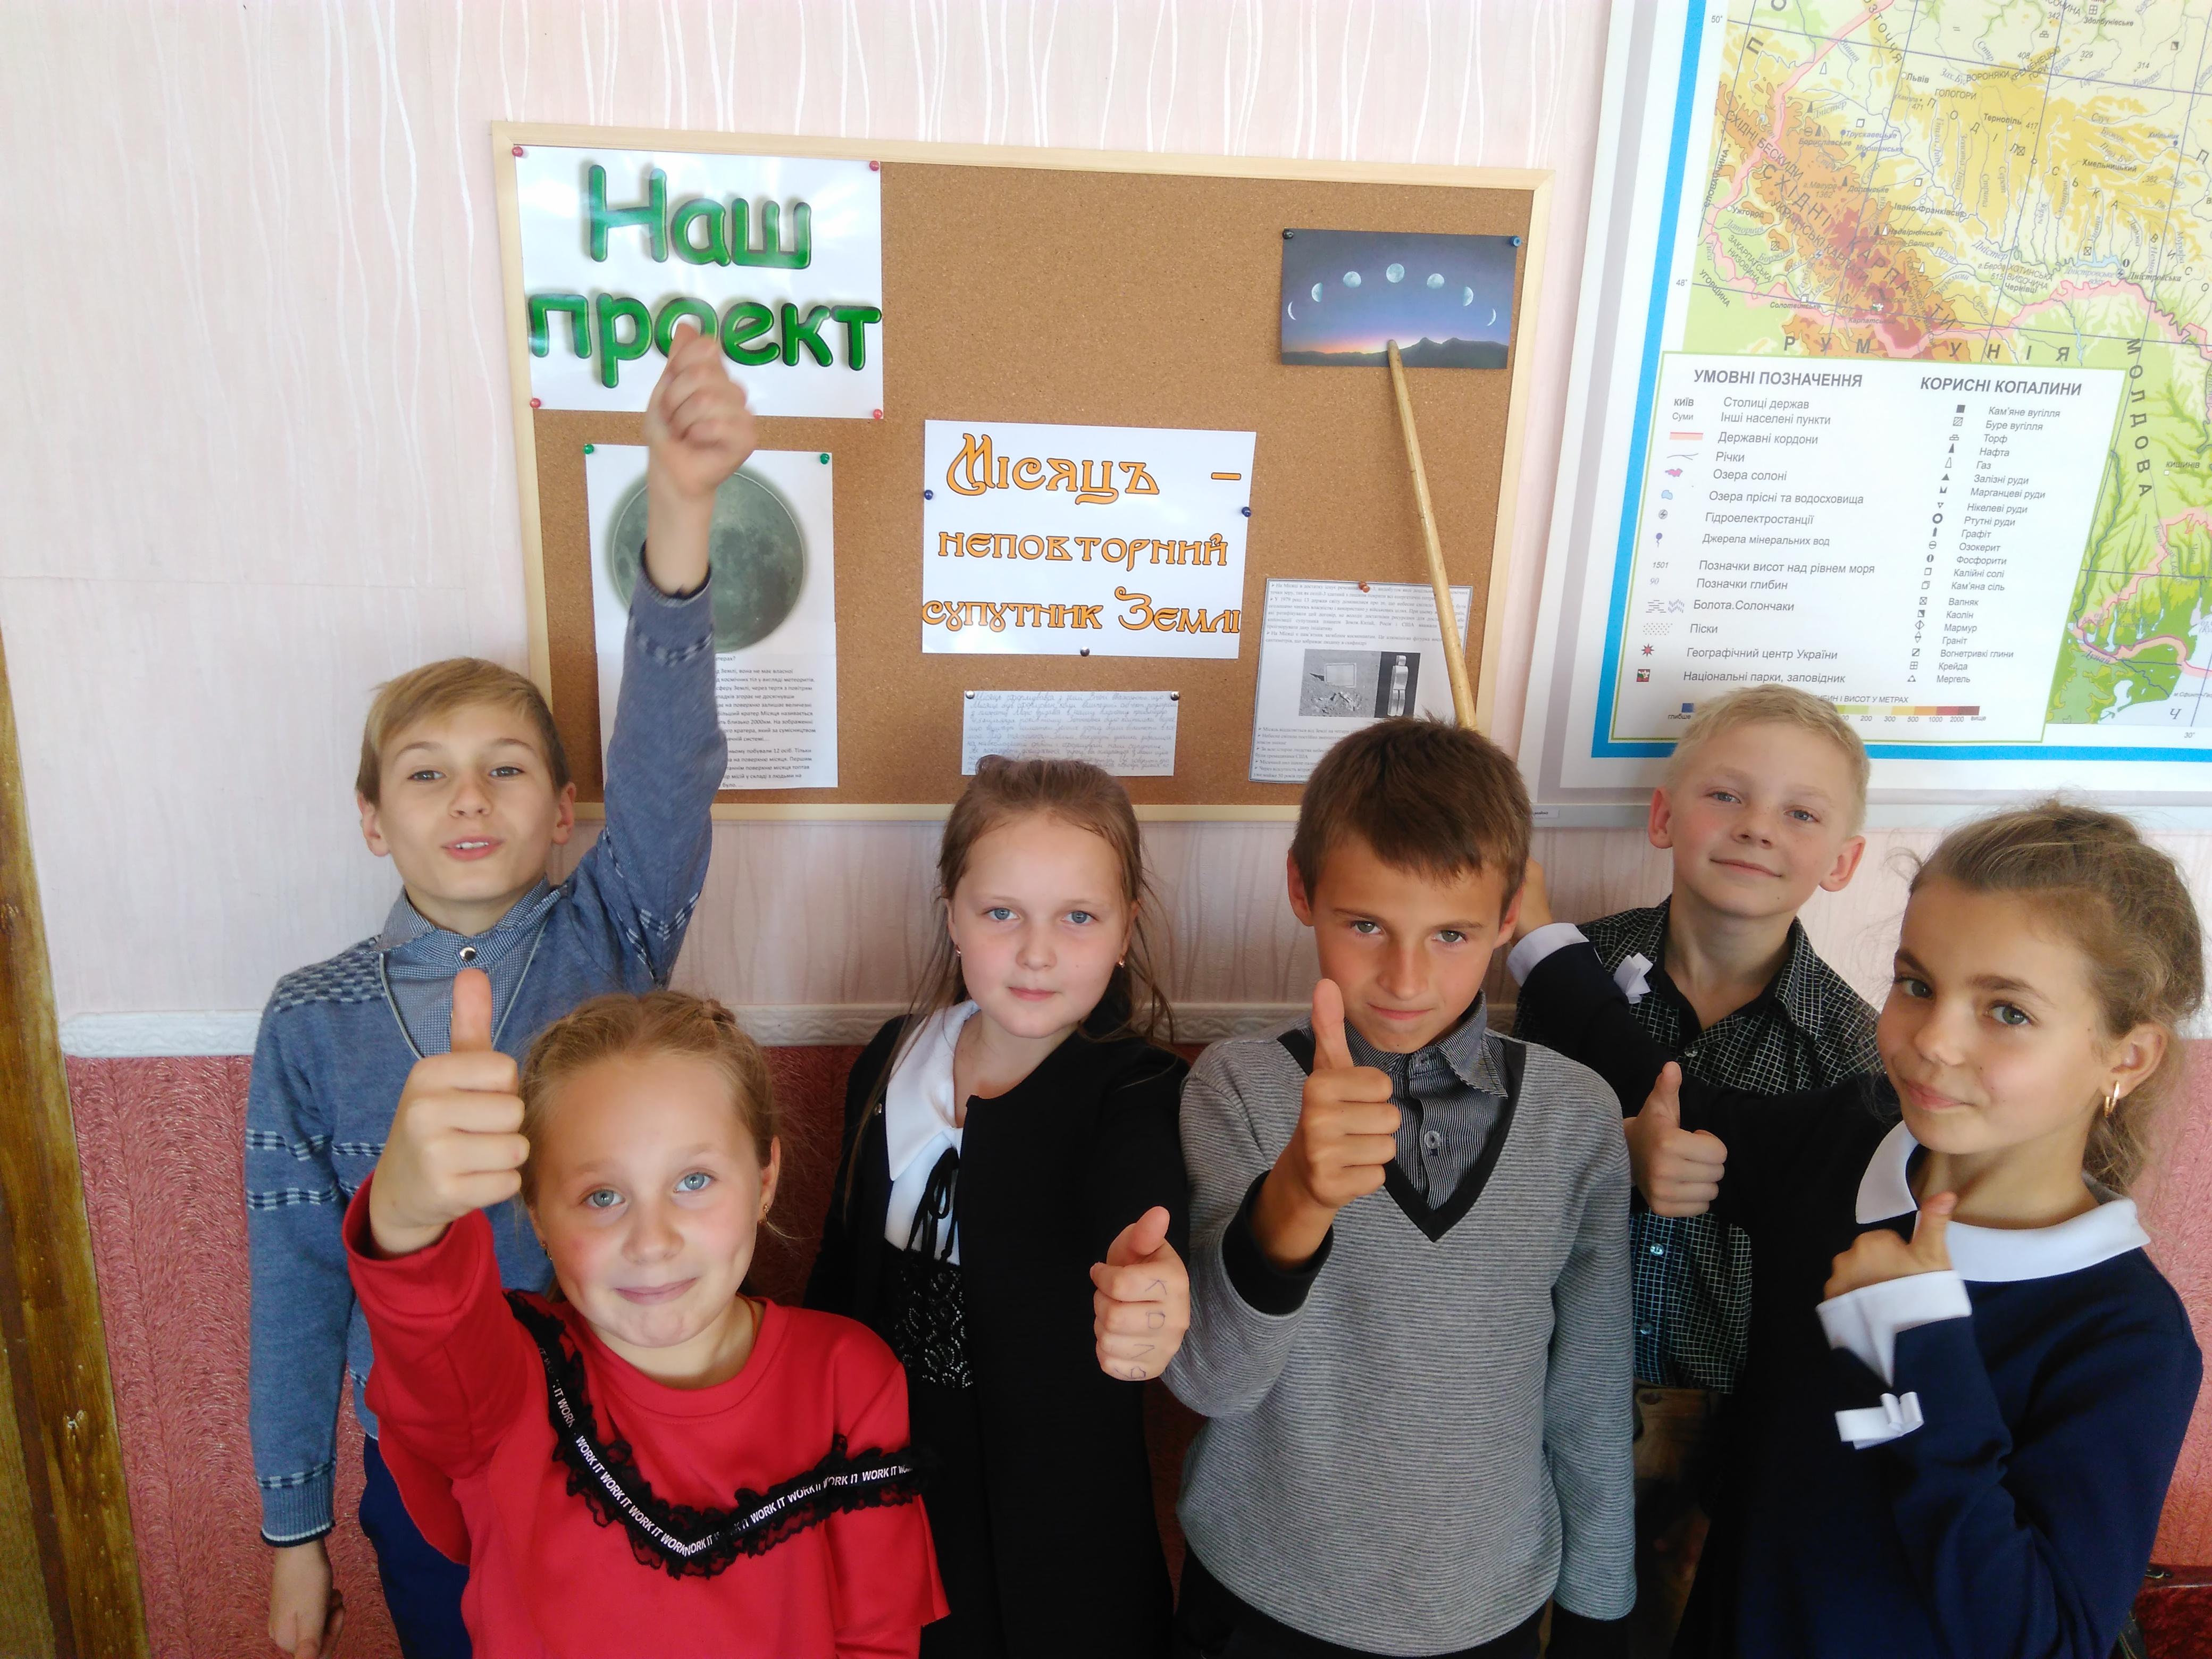 http://karl-gymnasium.at.ua/2a/6675445555.jpg